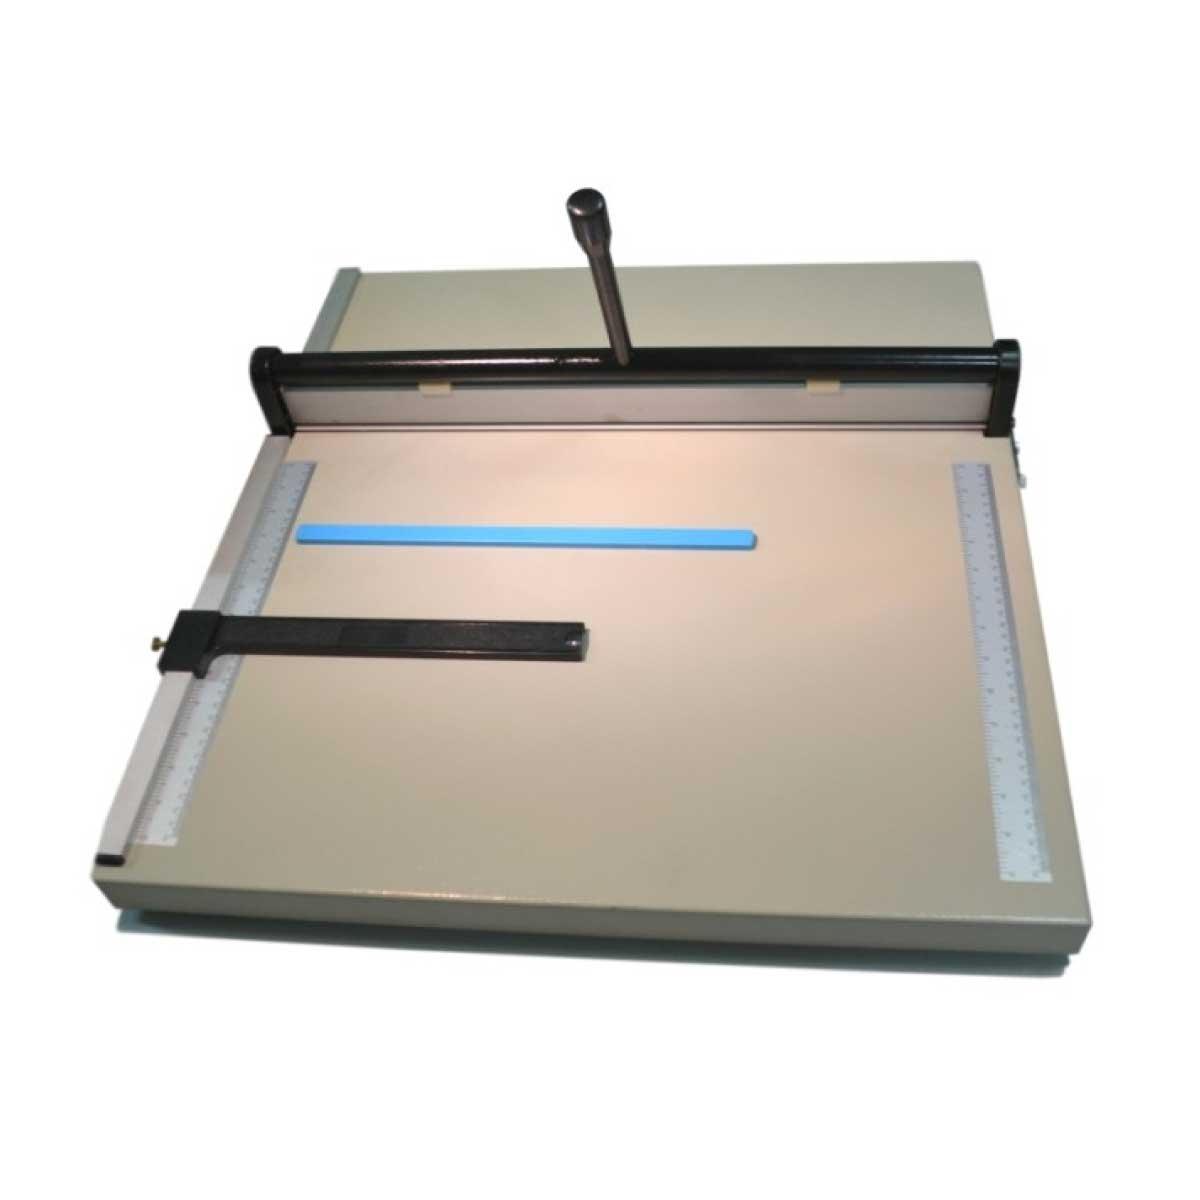 TPPS CM490 Manual Creasing Machine